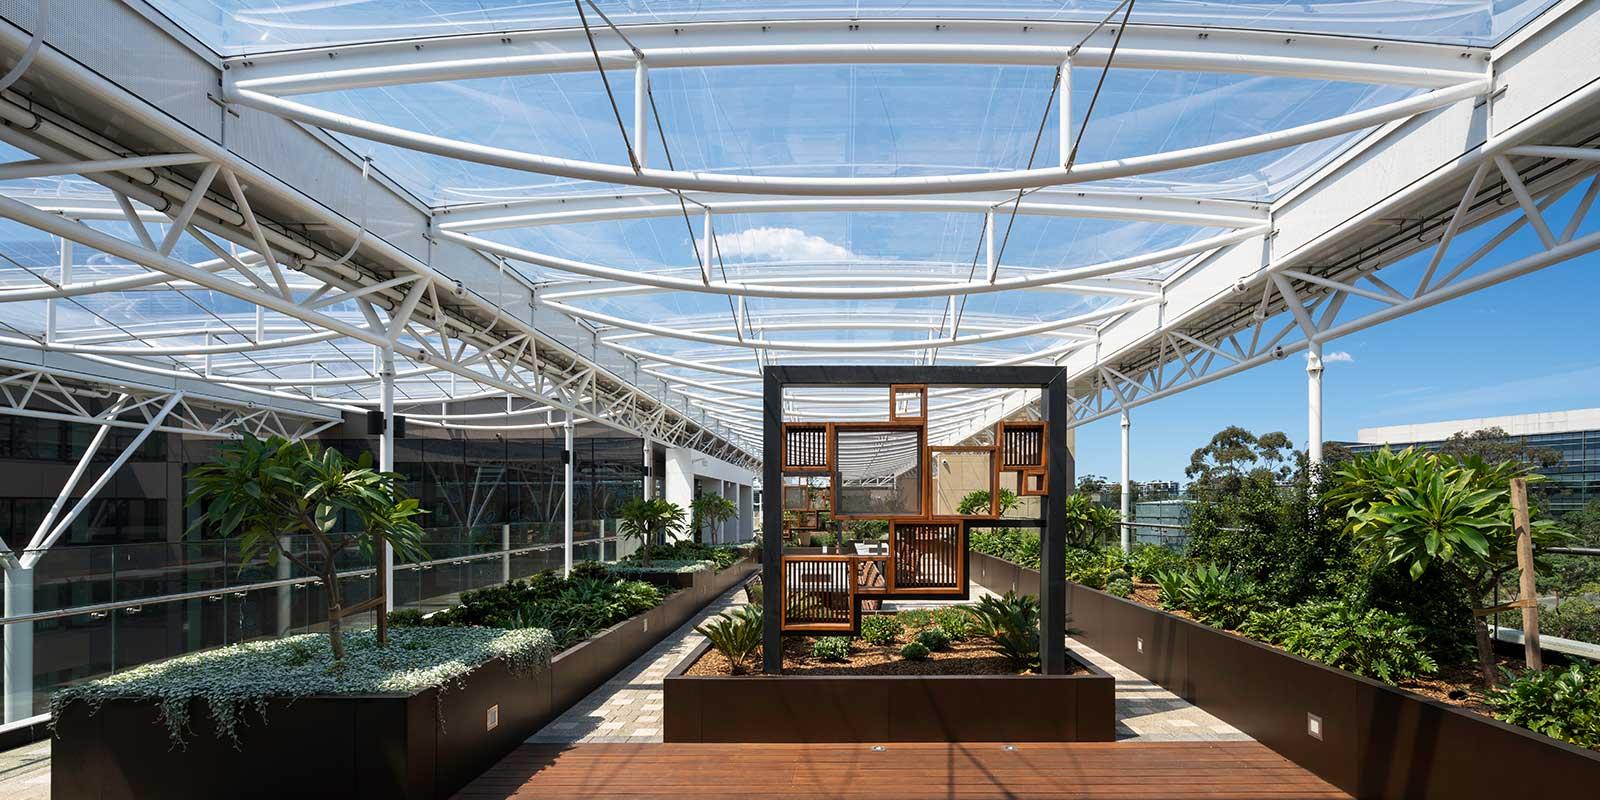 ETFE Roof - Macquarie University Arts Precinct. Photographer: Luke Zeme